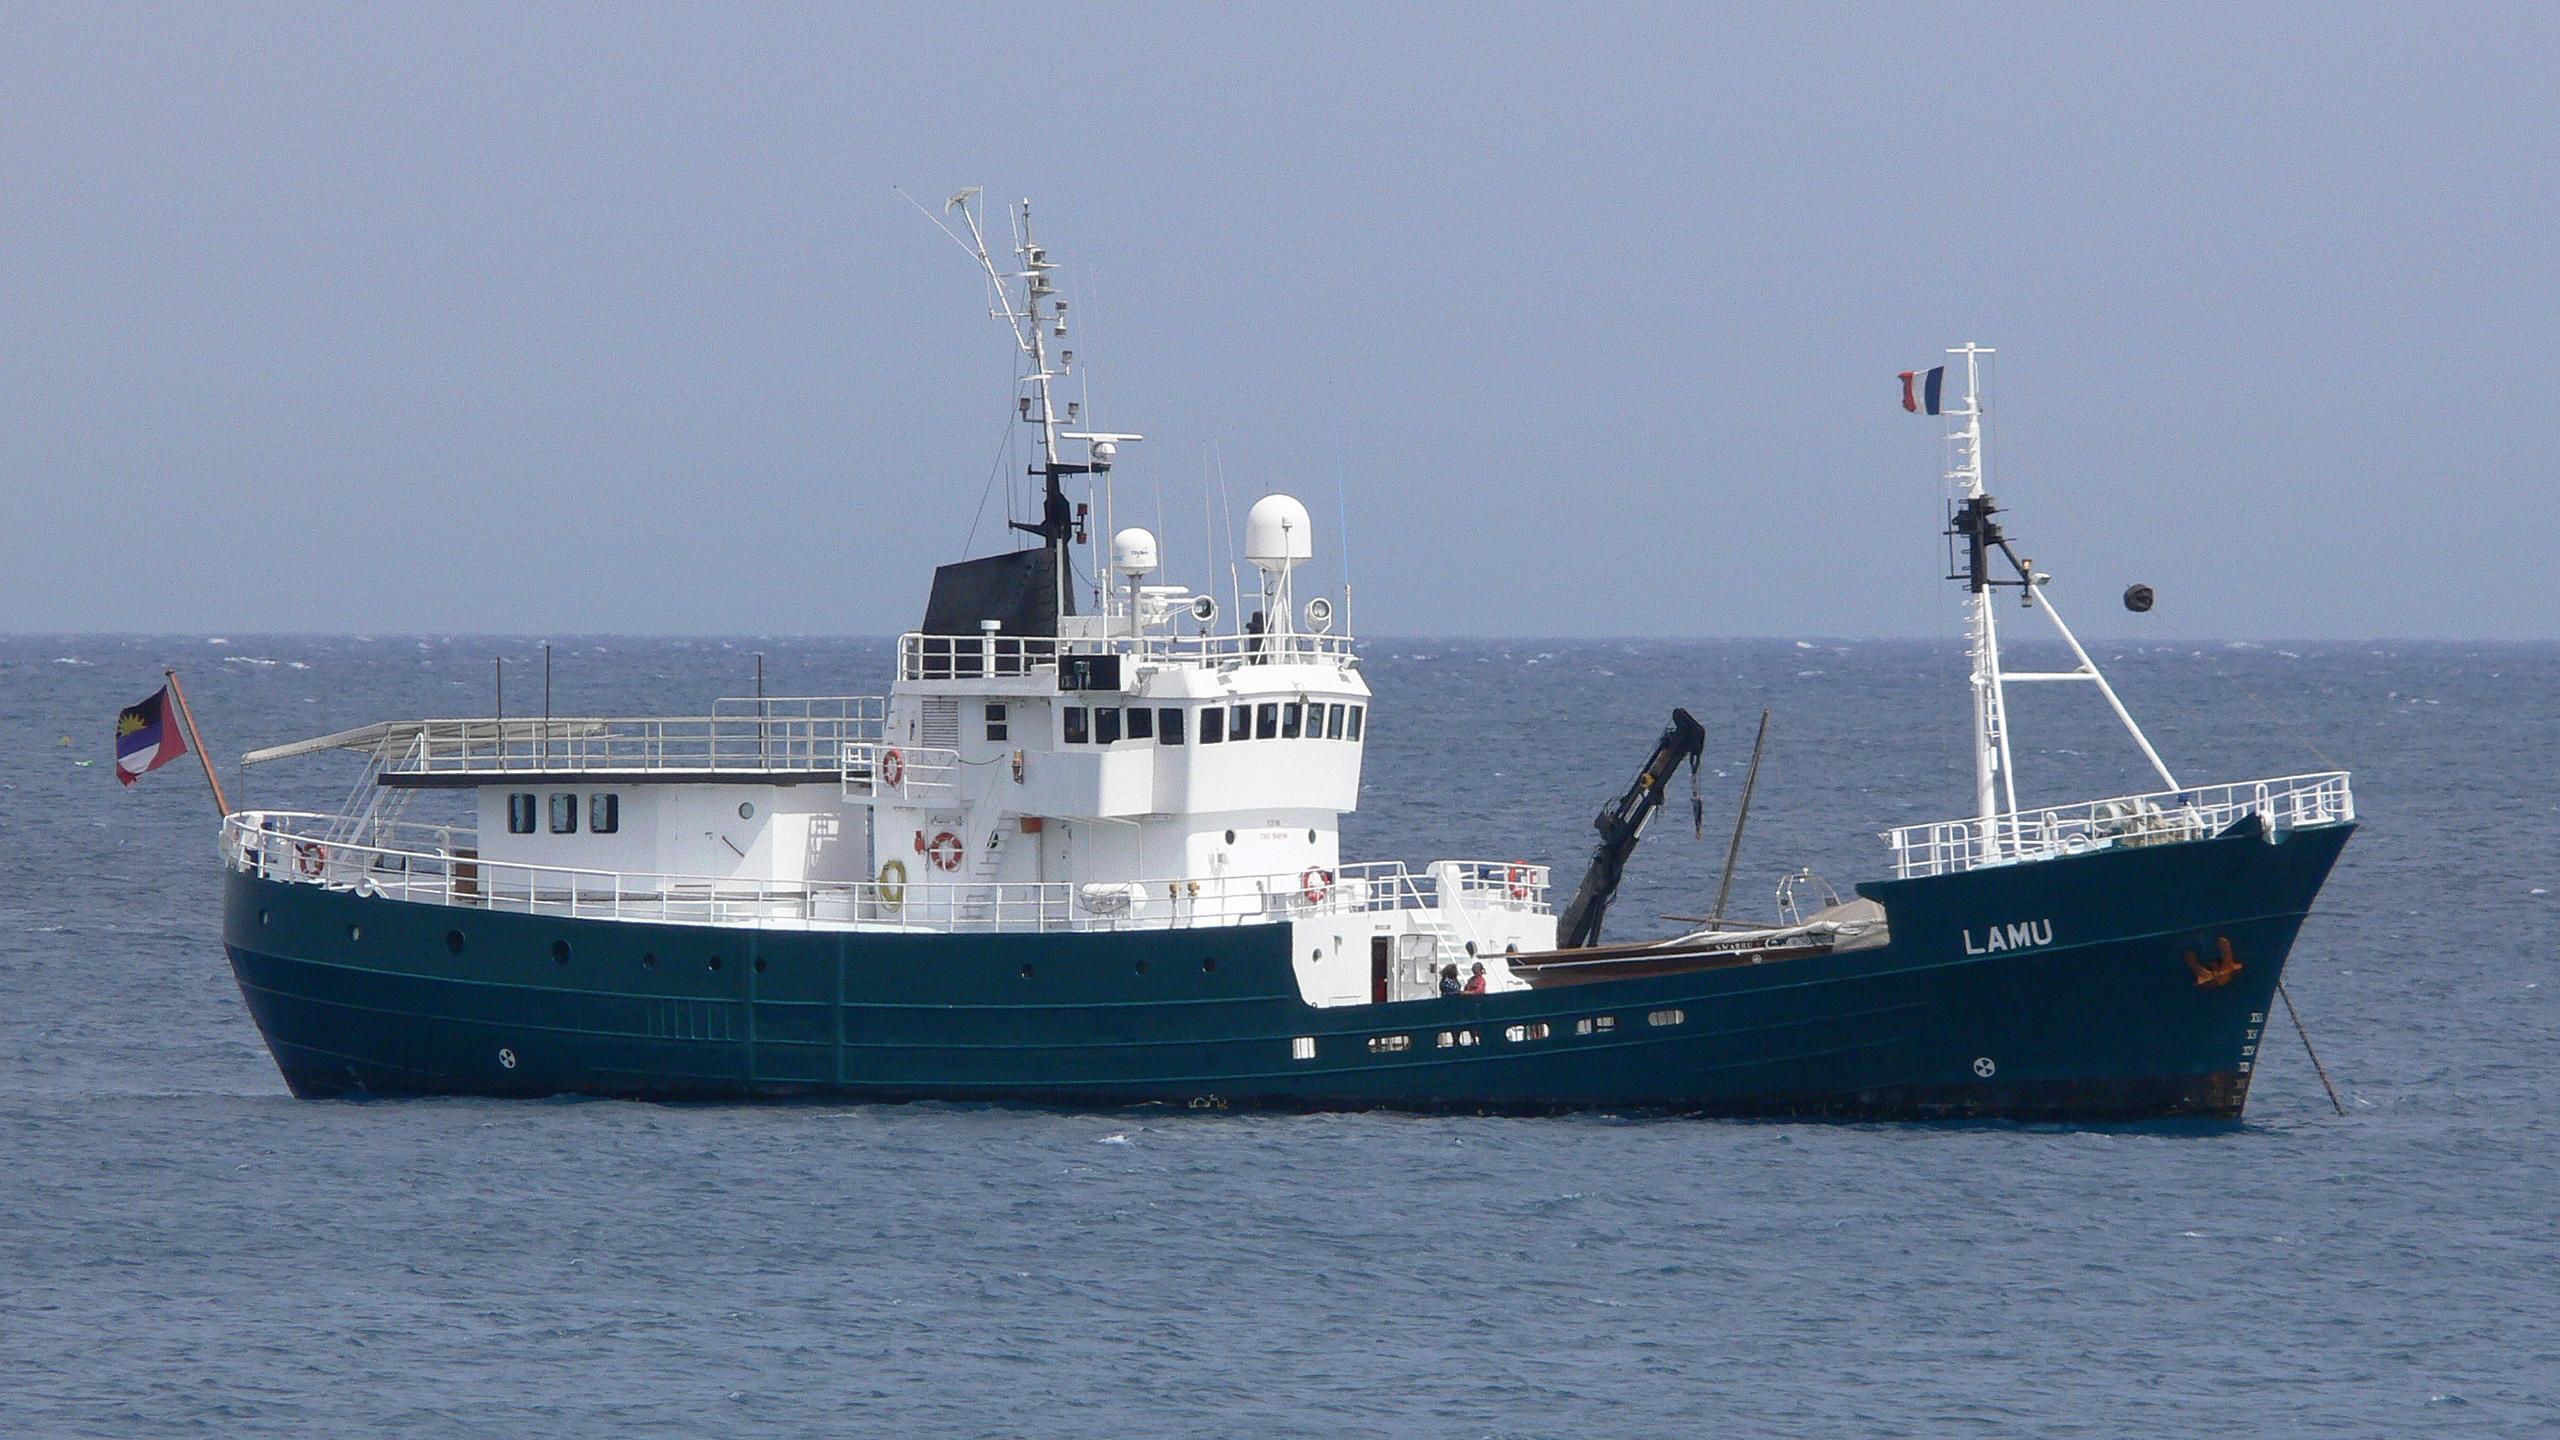 krebs-research-explorer-yacht-lewis-1953-51m-profile